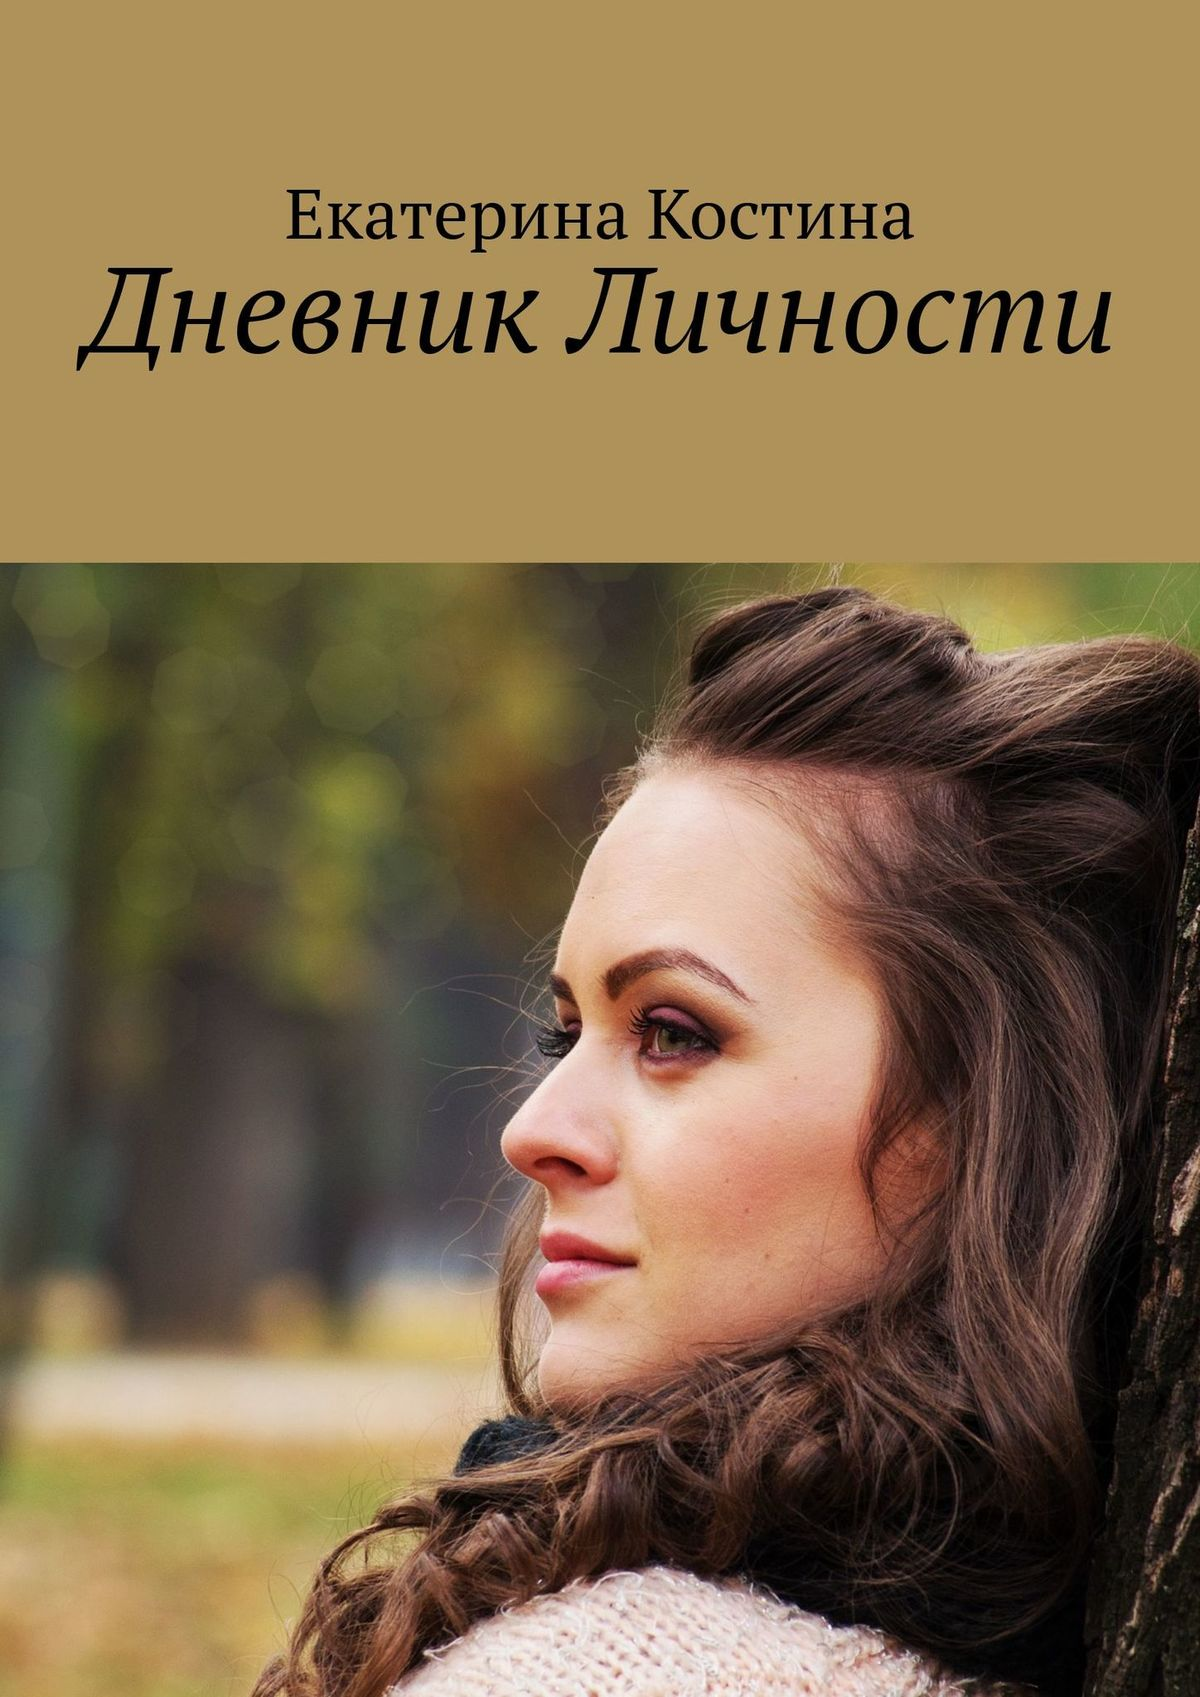 Дневник Личности